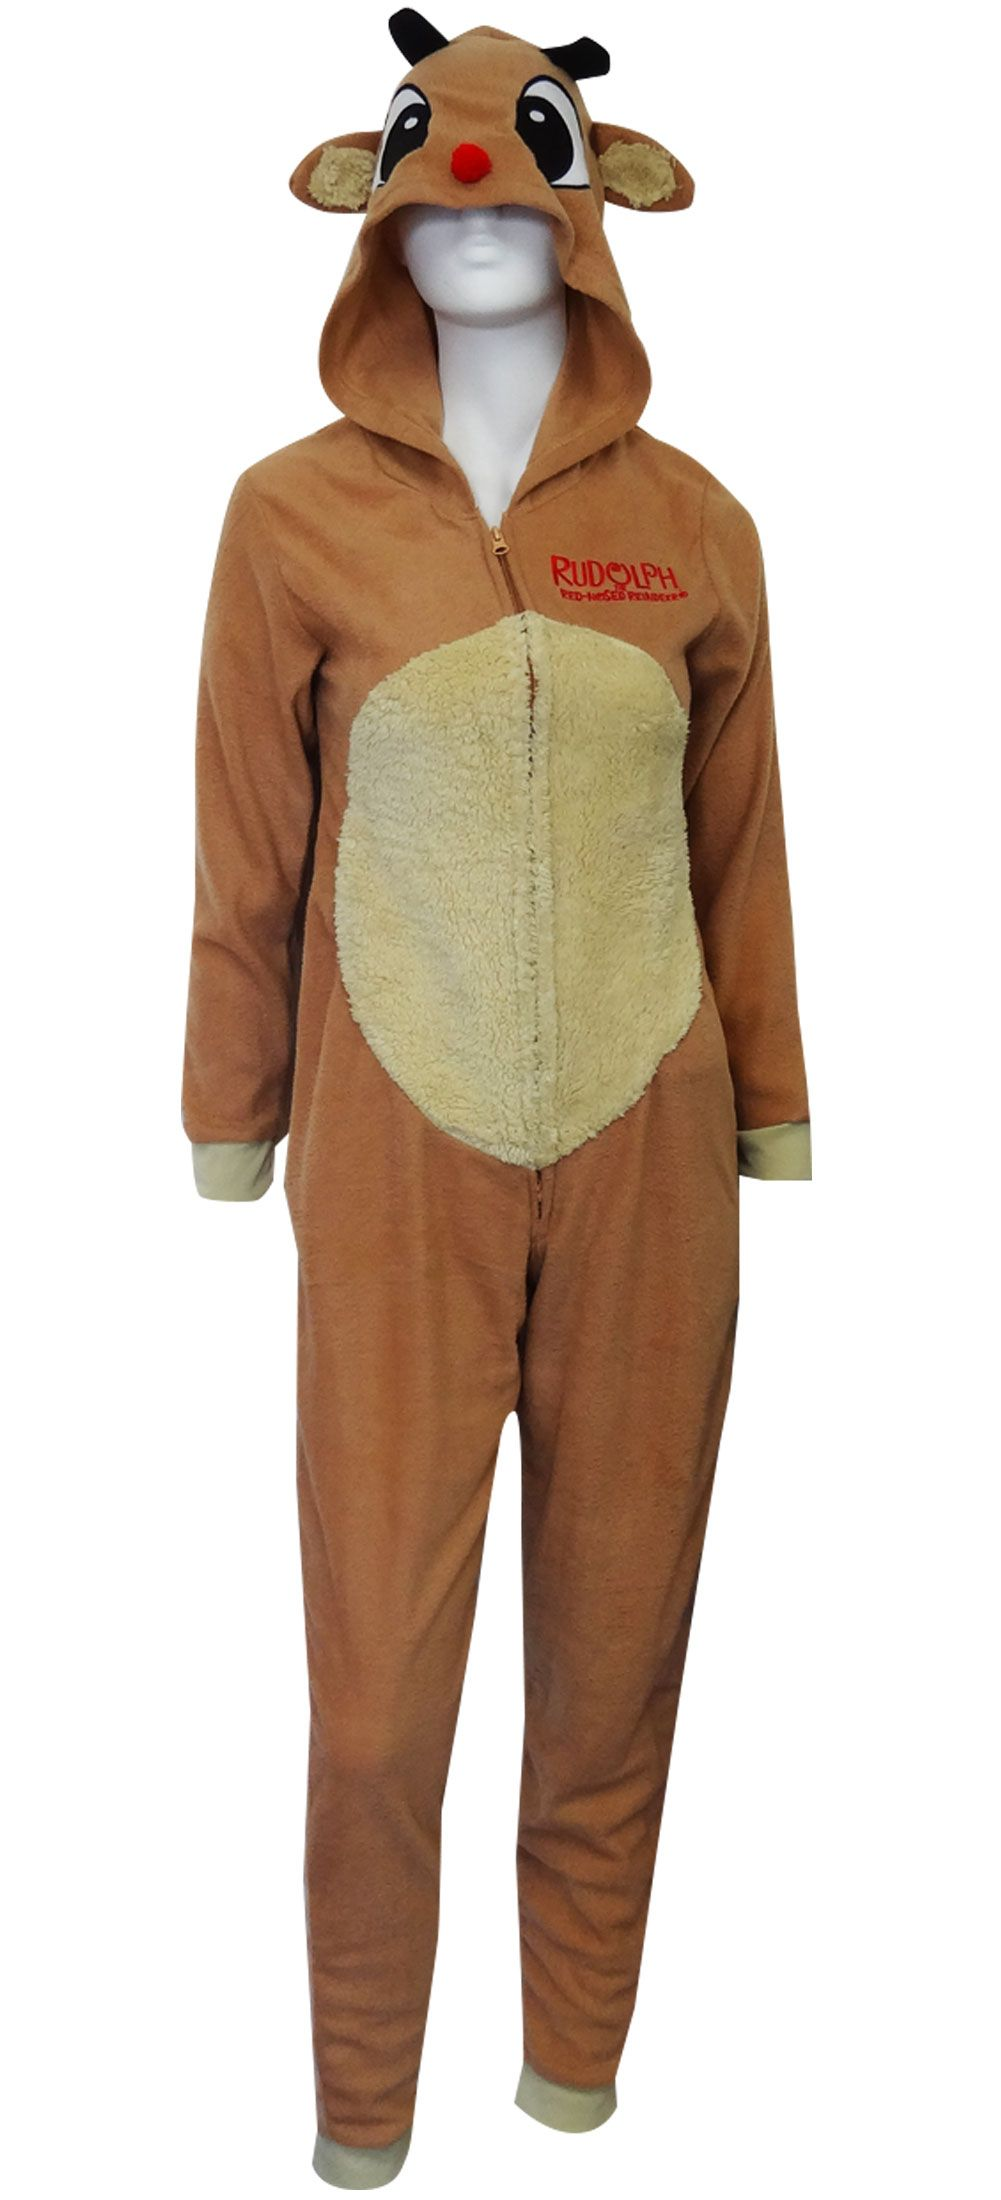 681189e0b357 WebUndies.com Dress Like Rudolph The Red-Nosed Reindeer Onesie Pajama